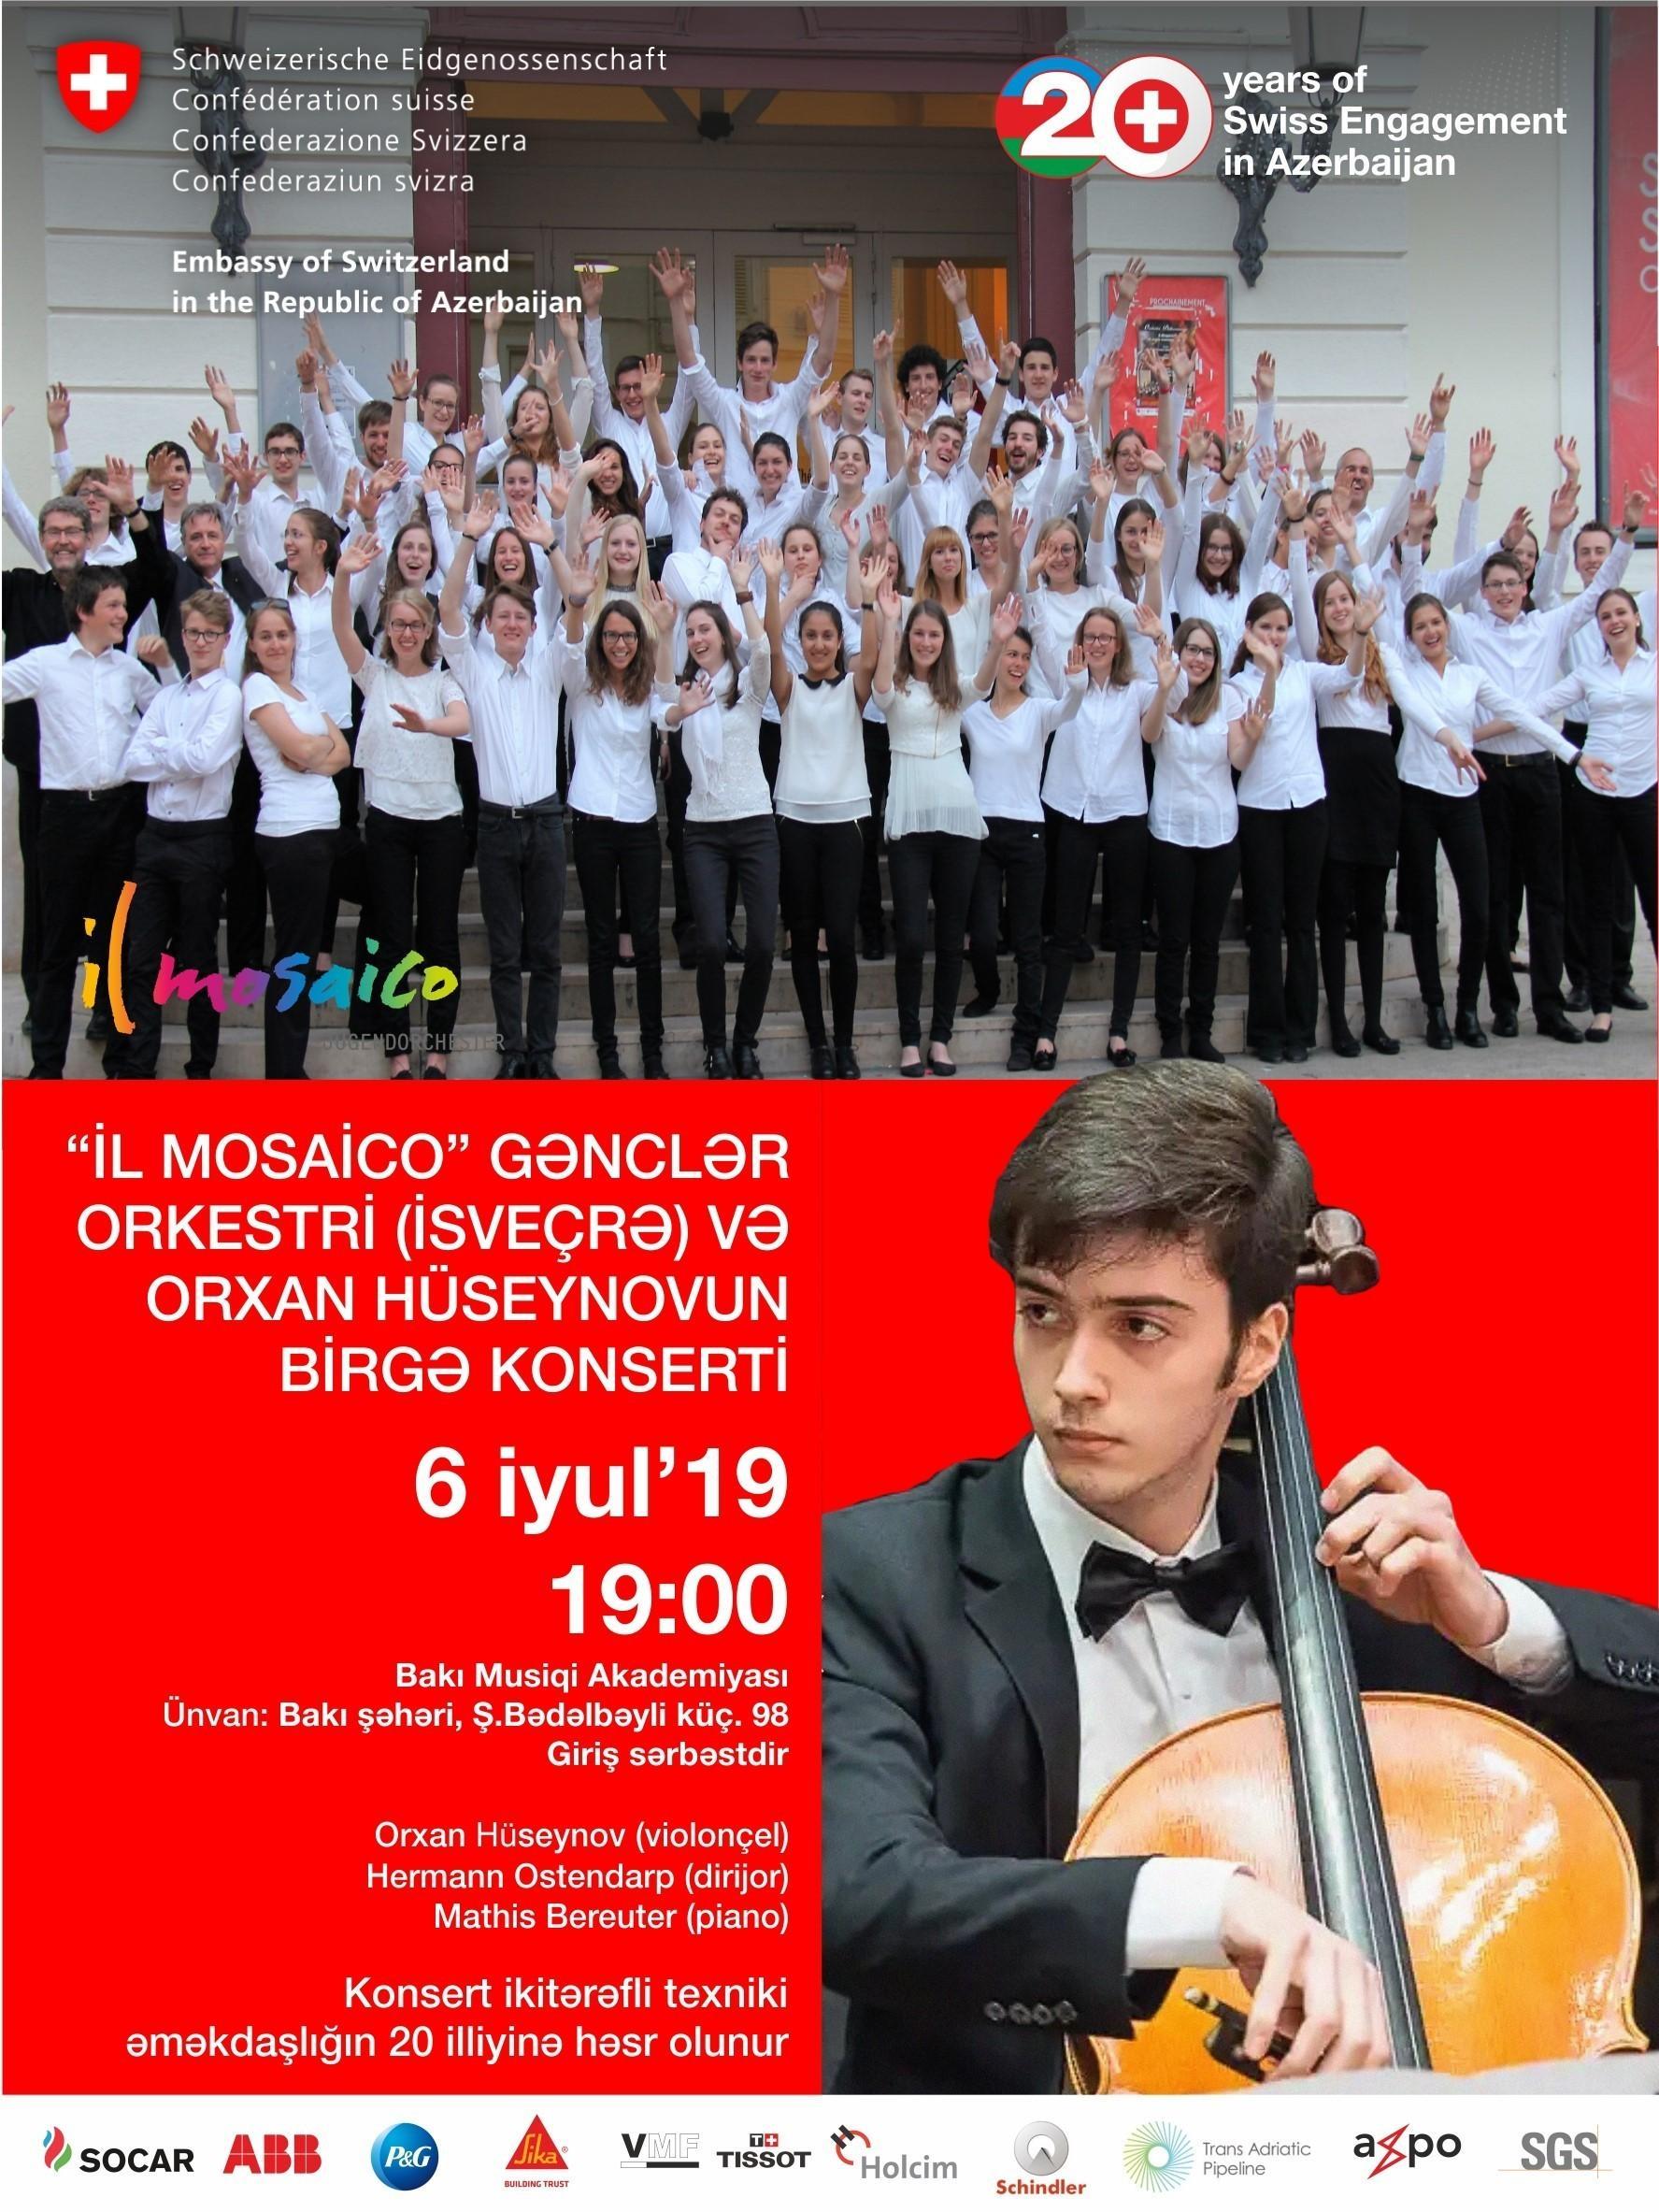 Baku and Gabala to host concerts dedicated to Azerbaijani-Swiss cooperation